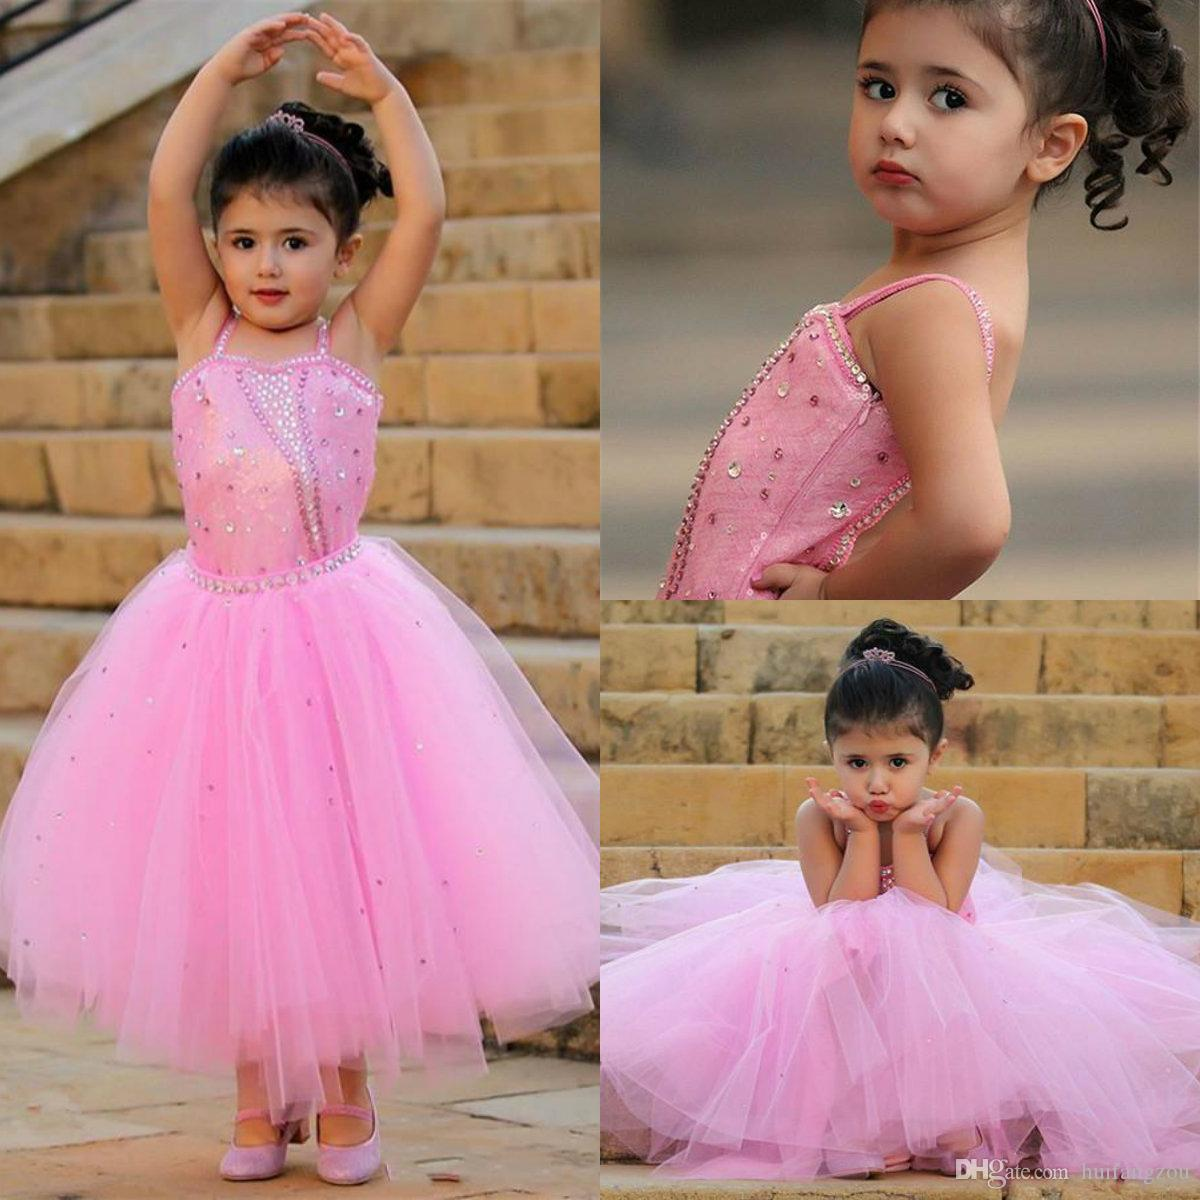 Cute Pink Flower Girl Dresses A Line Spaghetti Straps Shining Crystals  Sequins Tulle Kids Toddler Birthday Communion Girls Pageant Dress Vintage Flower  Girl ... c0733ed9e6e4